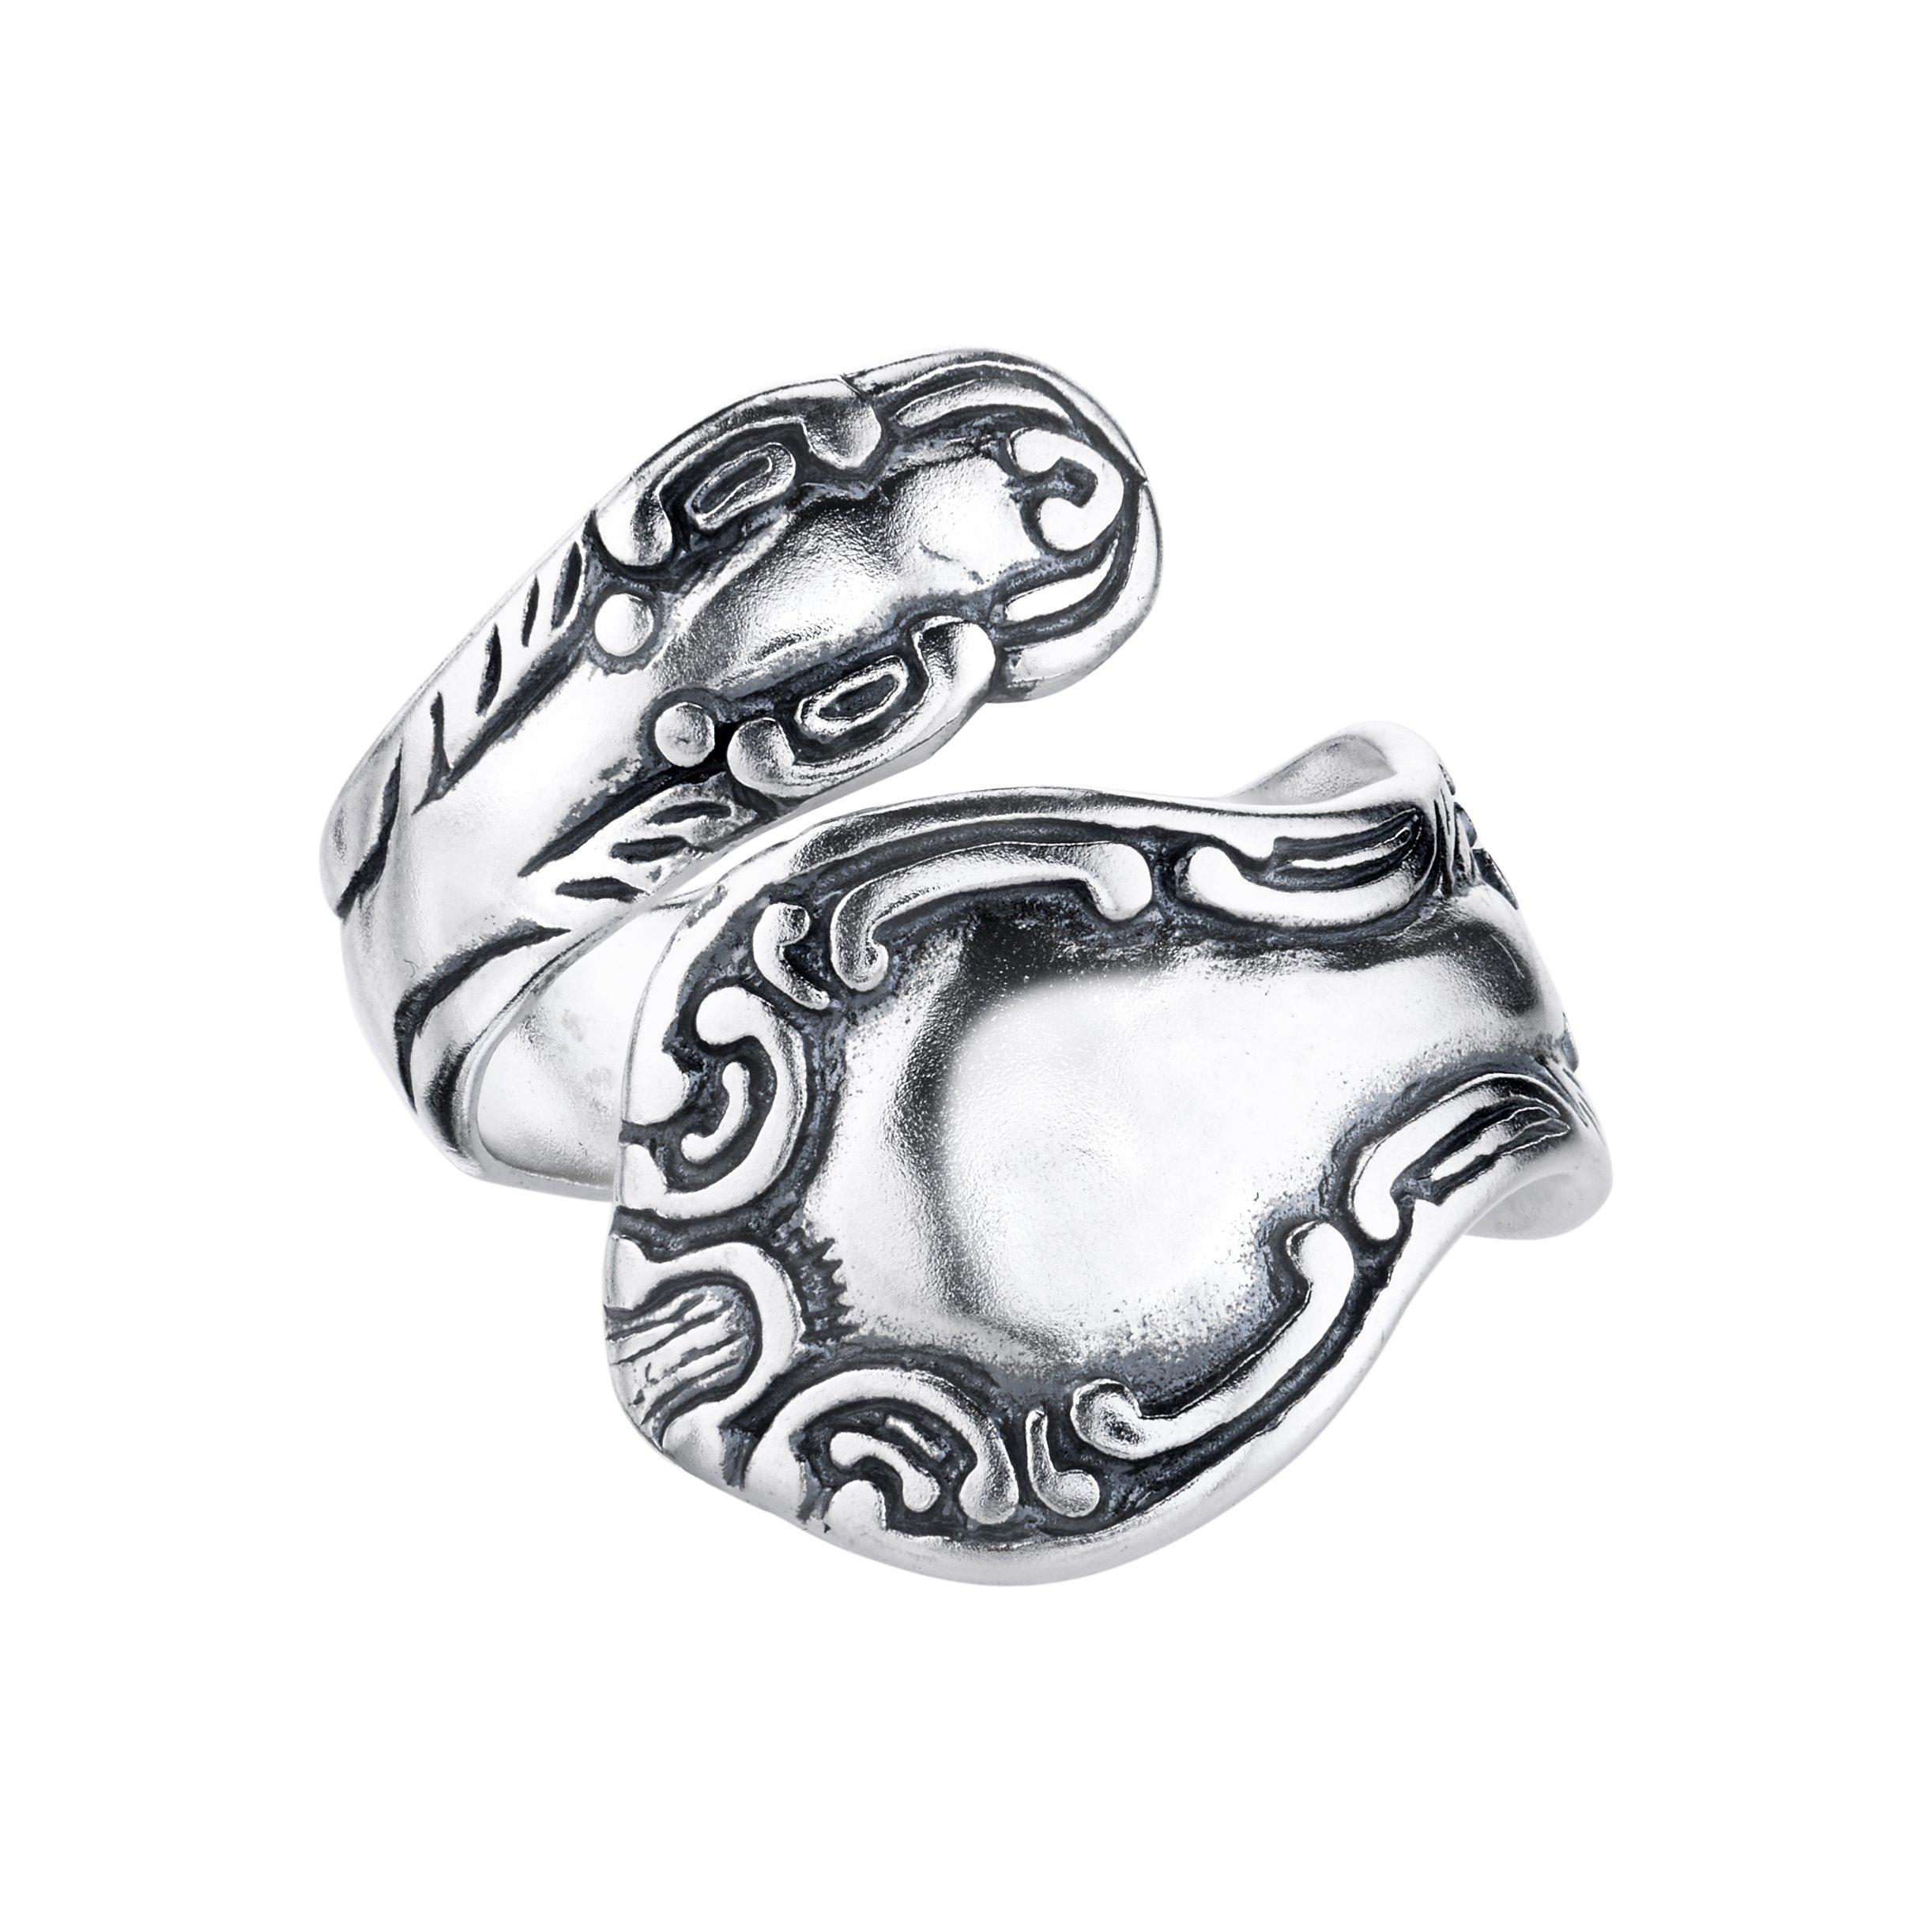 BSE Sterling Silver Swirl Motif Spoon Style Ring, Sizes 6-11